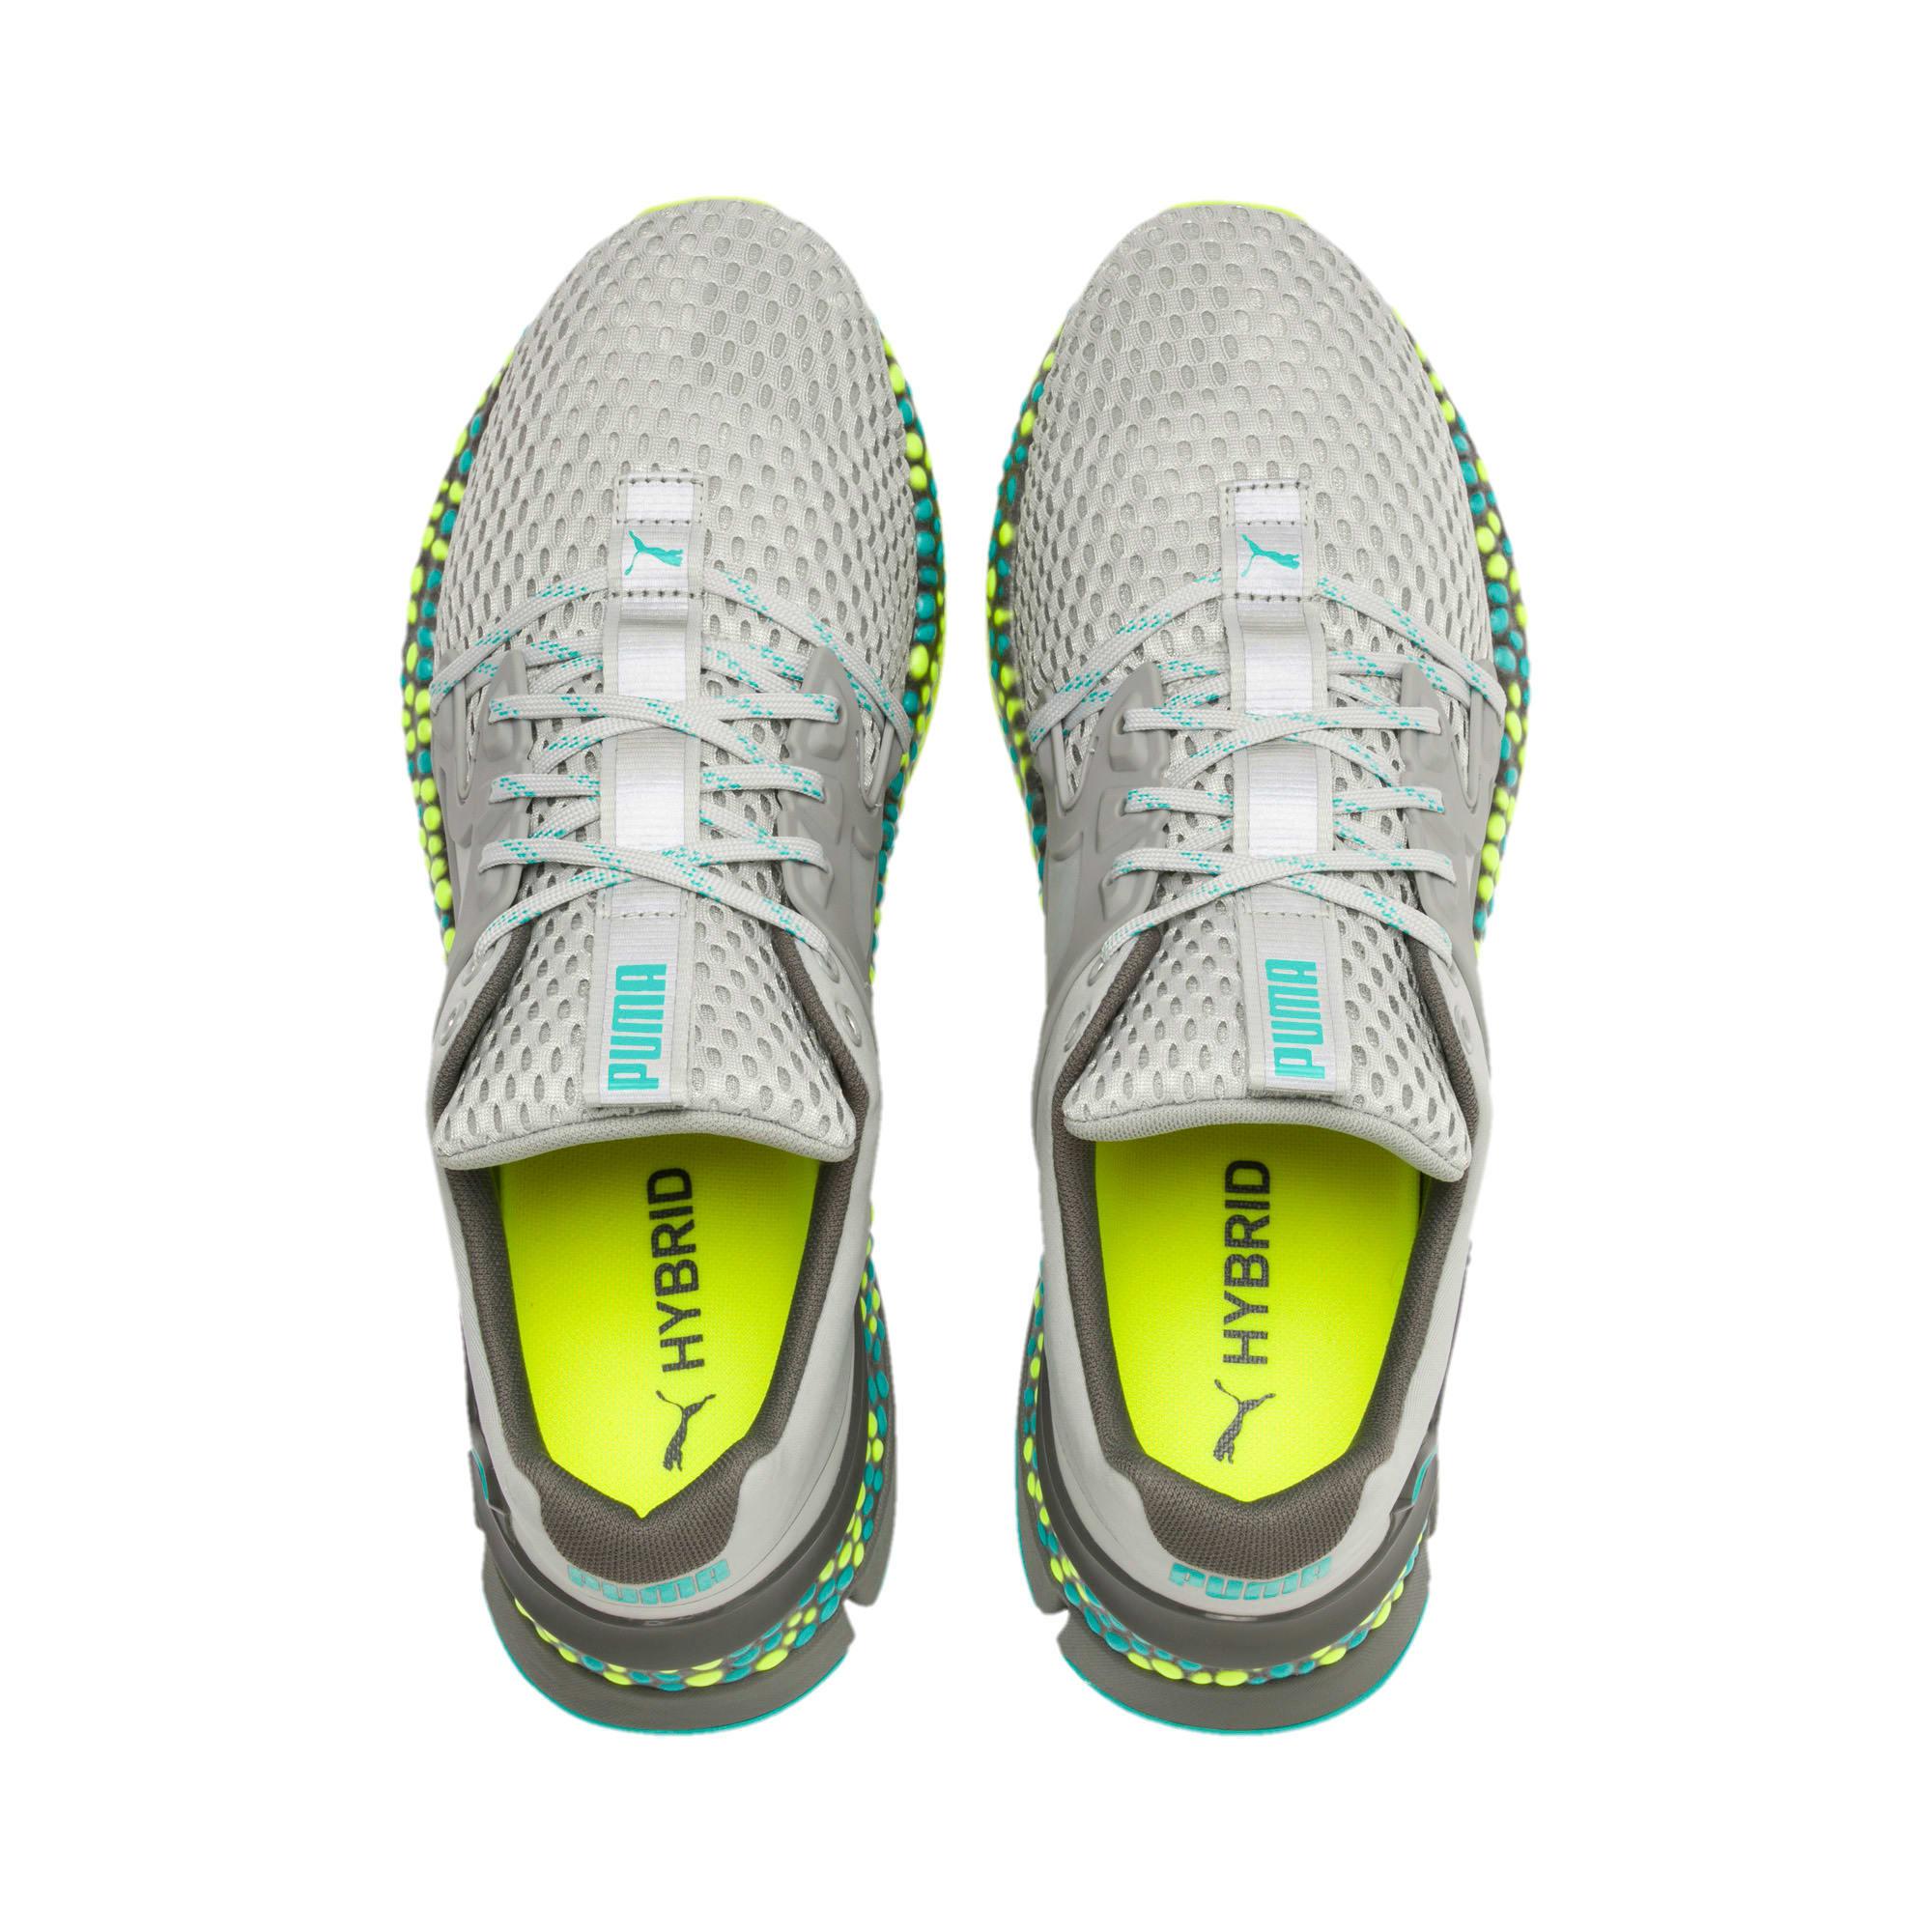 Thumbnail 7 of HYBRID Sky Men's Running Shoes, High Rise-Blue Turquoise, medium